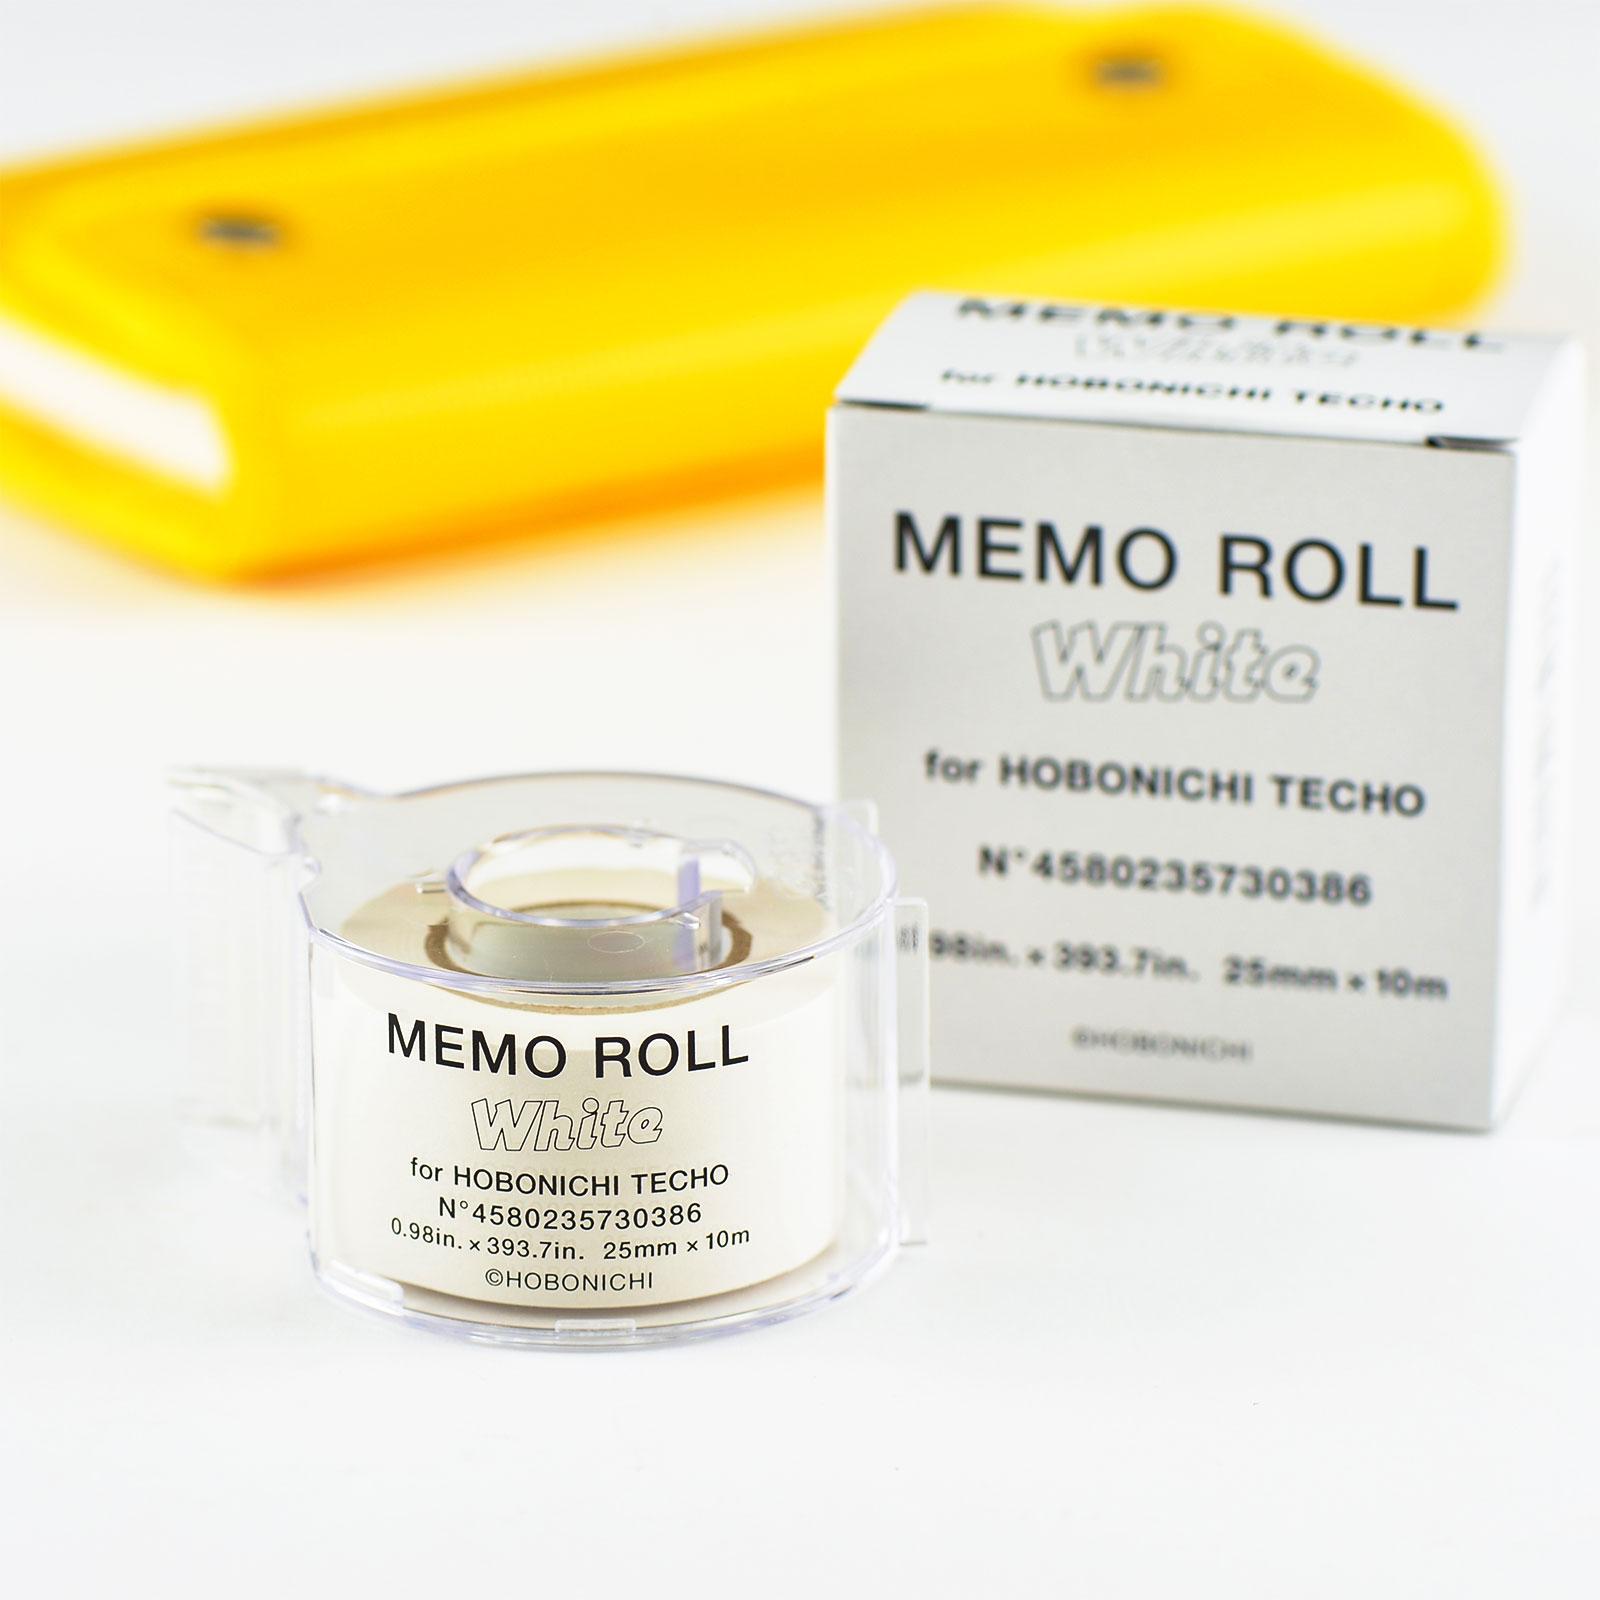 memo roll 文房具 雑貨ラインナップ ほぼ日手帳 2019